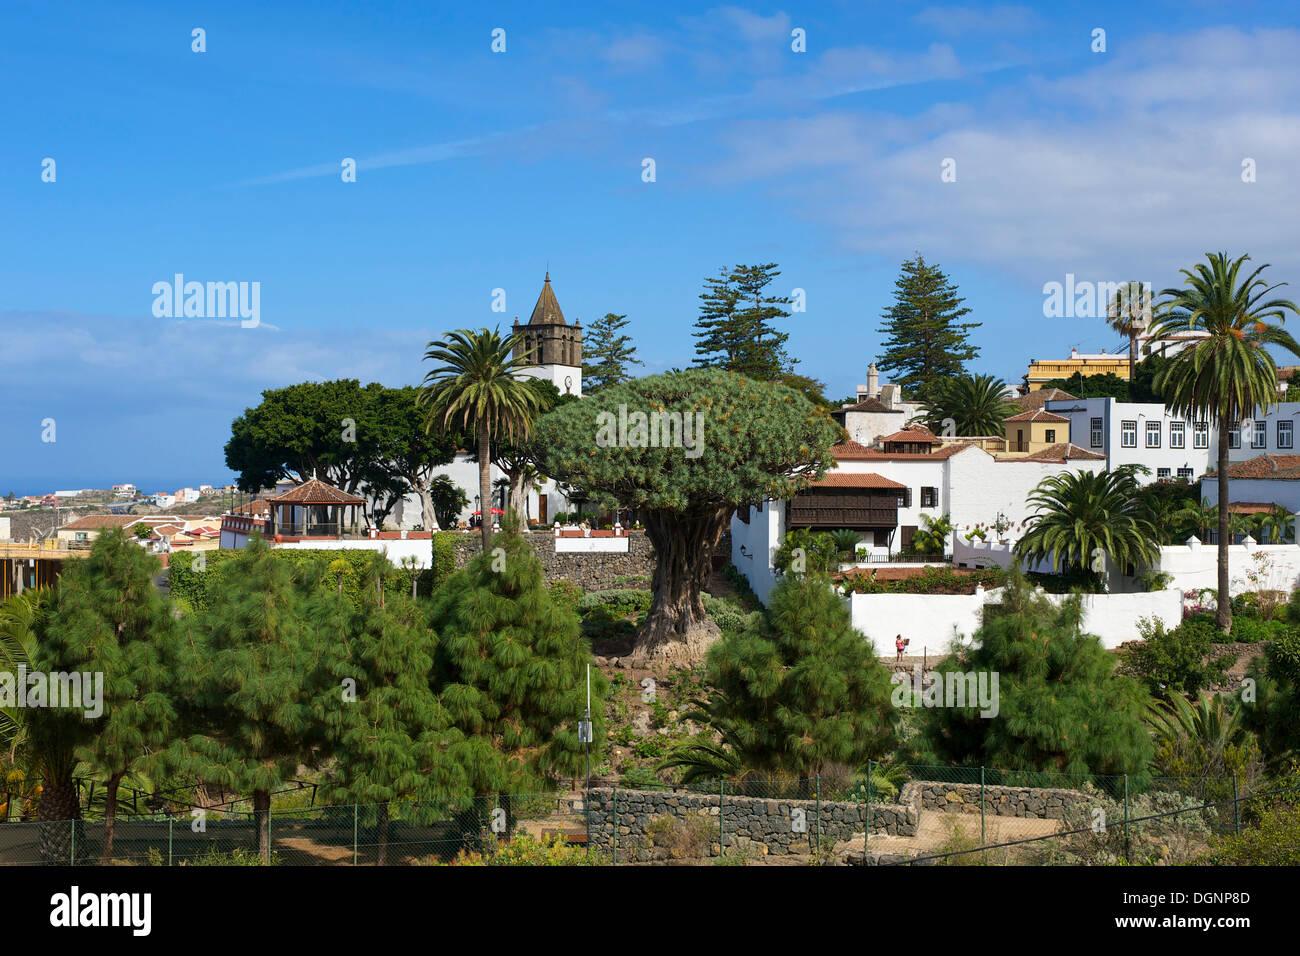 Drachenbaum in Icod, Teneriffa, Kanarische Inseln, Spanien, Europa Stockbild